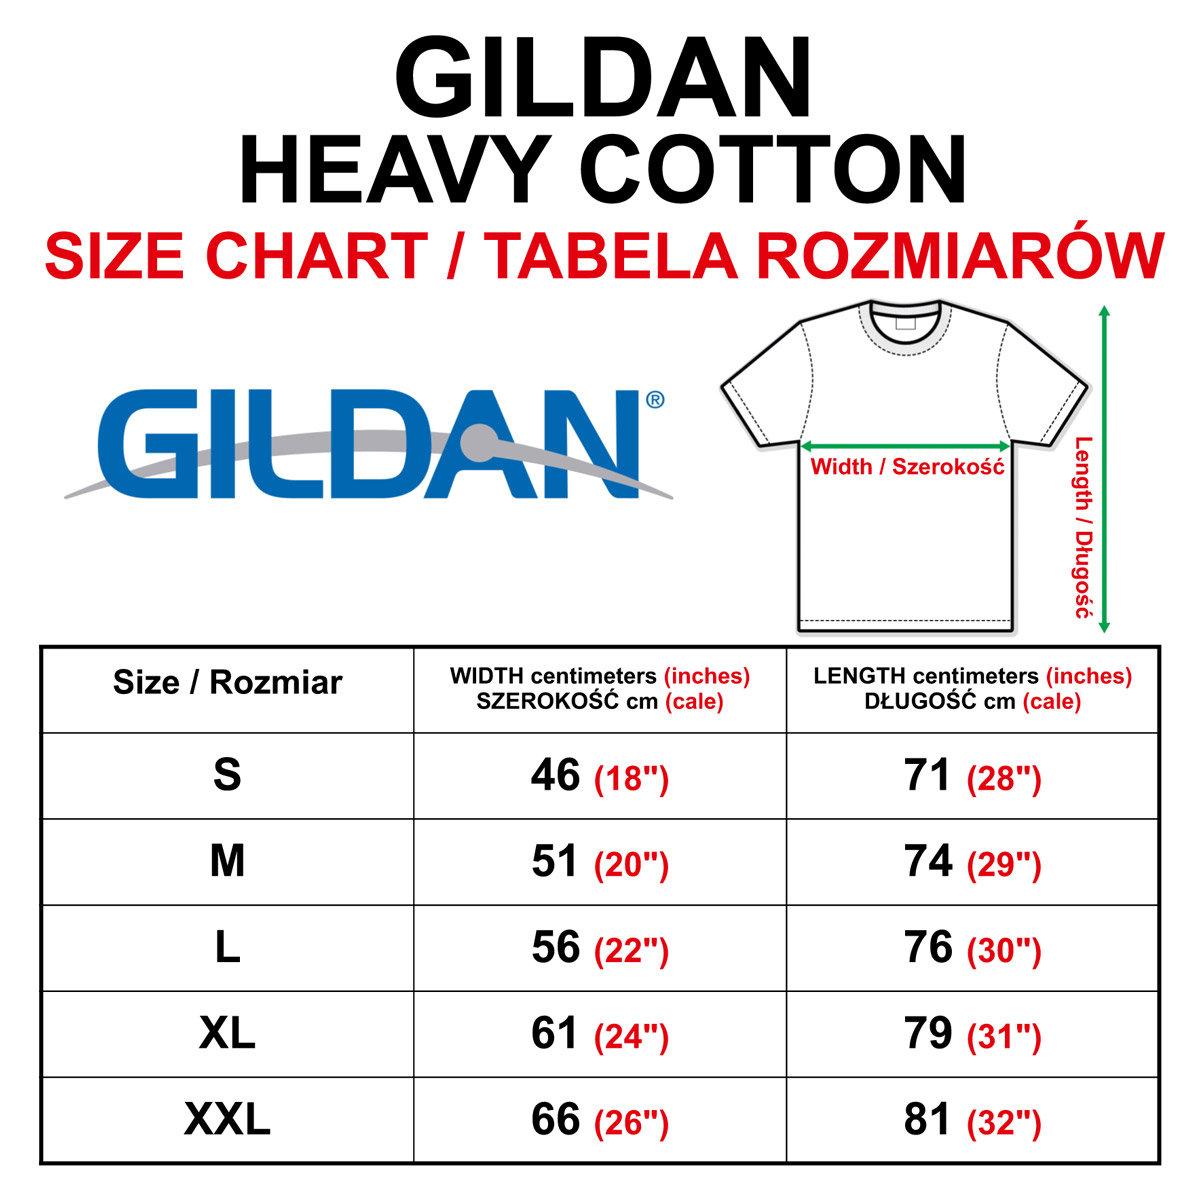 T Shirt Size Chart: Gildan Heavy Cotton T Shirt Size Chart